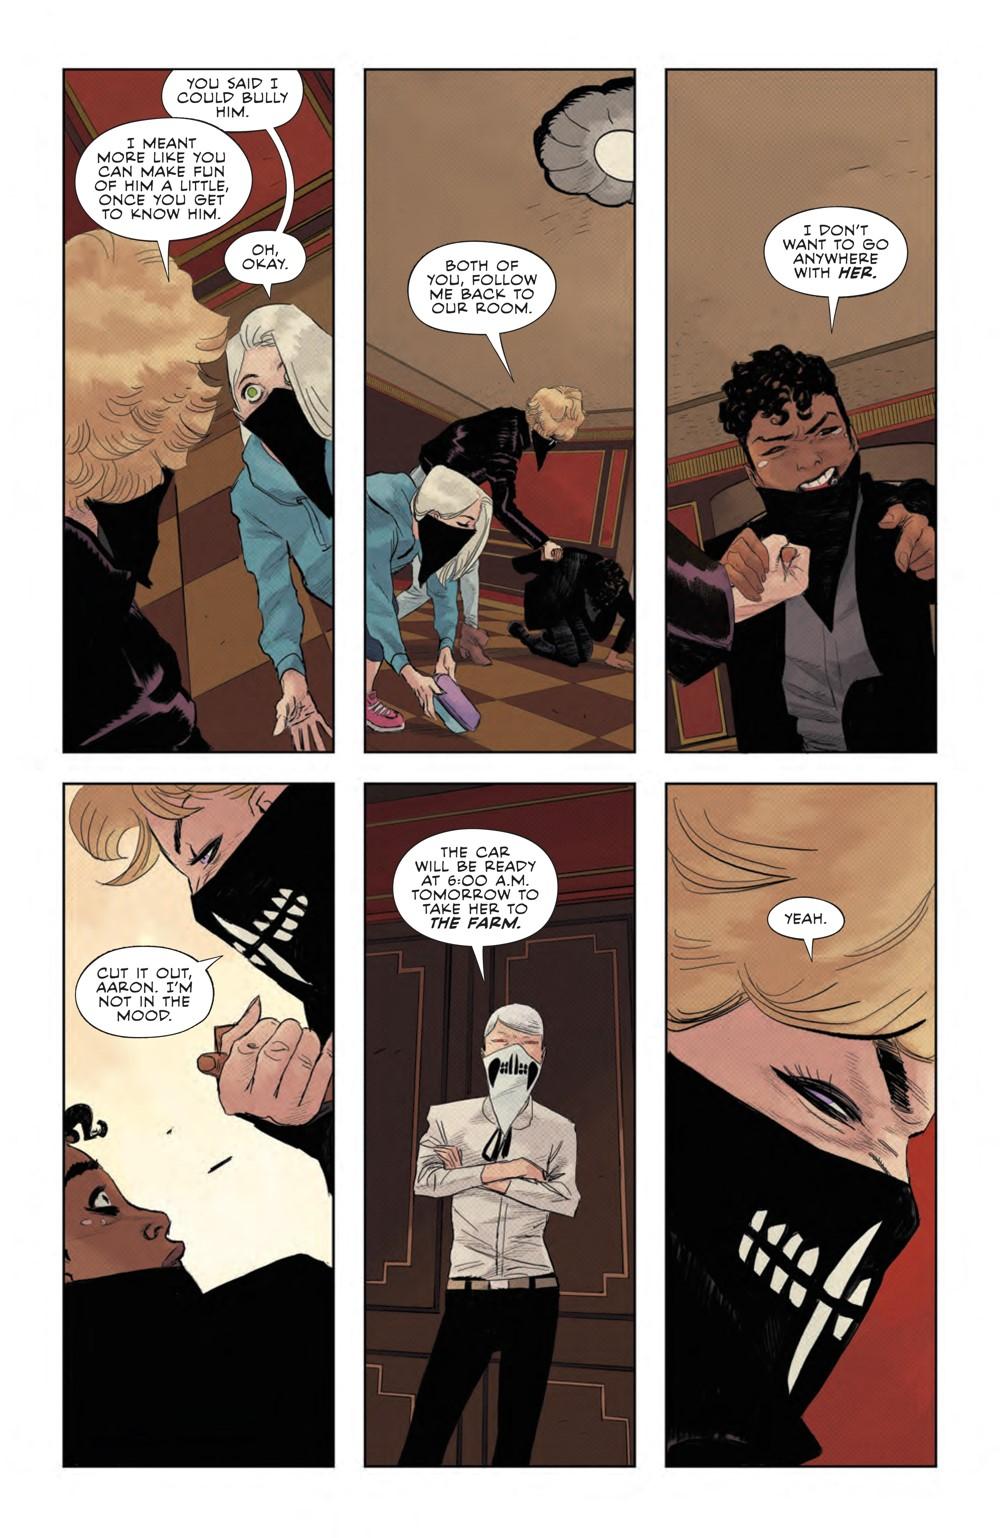 SomethingKillingChildren_017_PRESS_5 ComicList Previews: SOMETHING IS KILLING THE CHILDREN #17